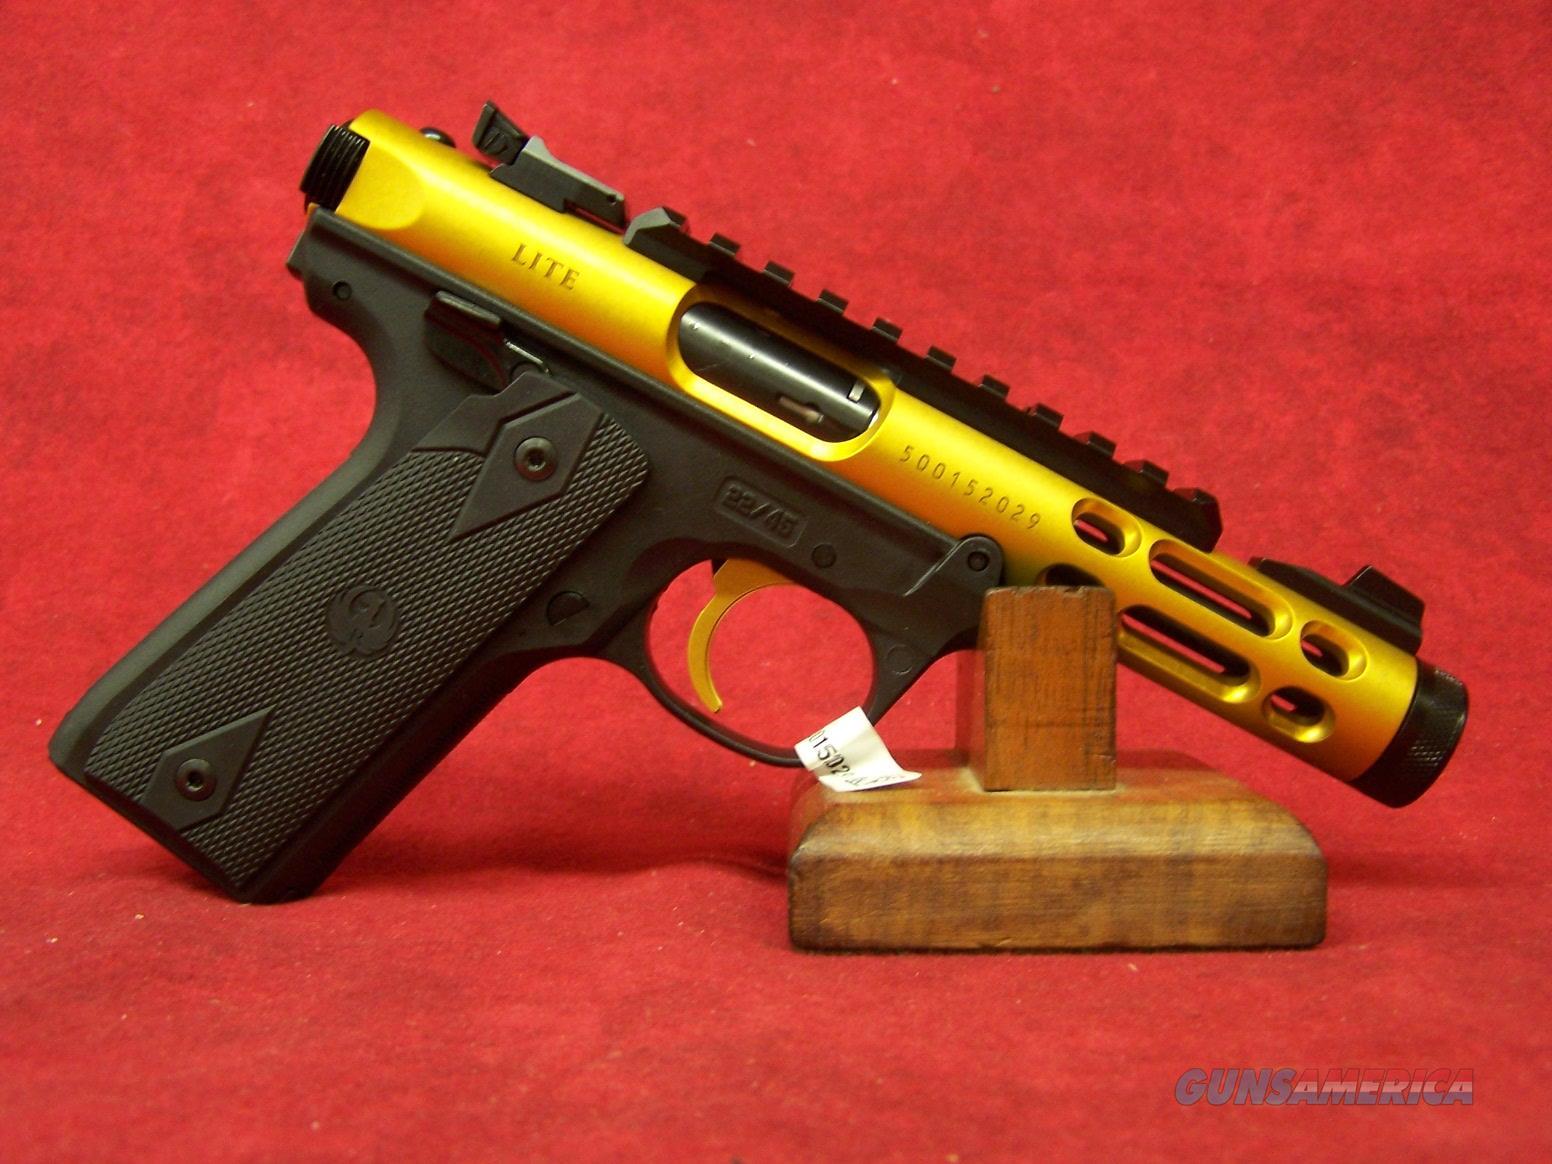 "Ruger Mark IV 22/45 Lite Gold Anodized .22LR 4.4"" Barrel (43926)  Guns > Pistols > Ruger Semi-Auto Pistols > Mark I/II/III/IV Family"